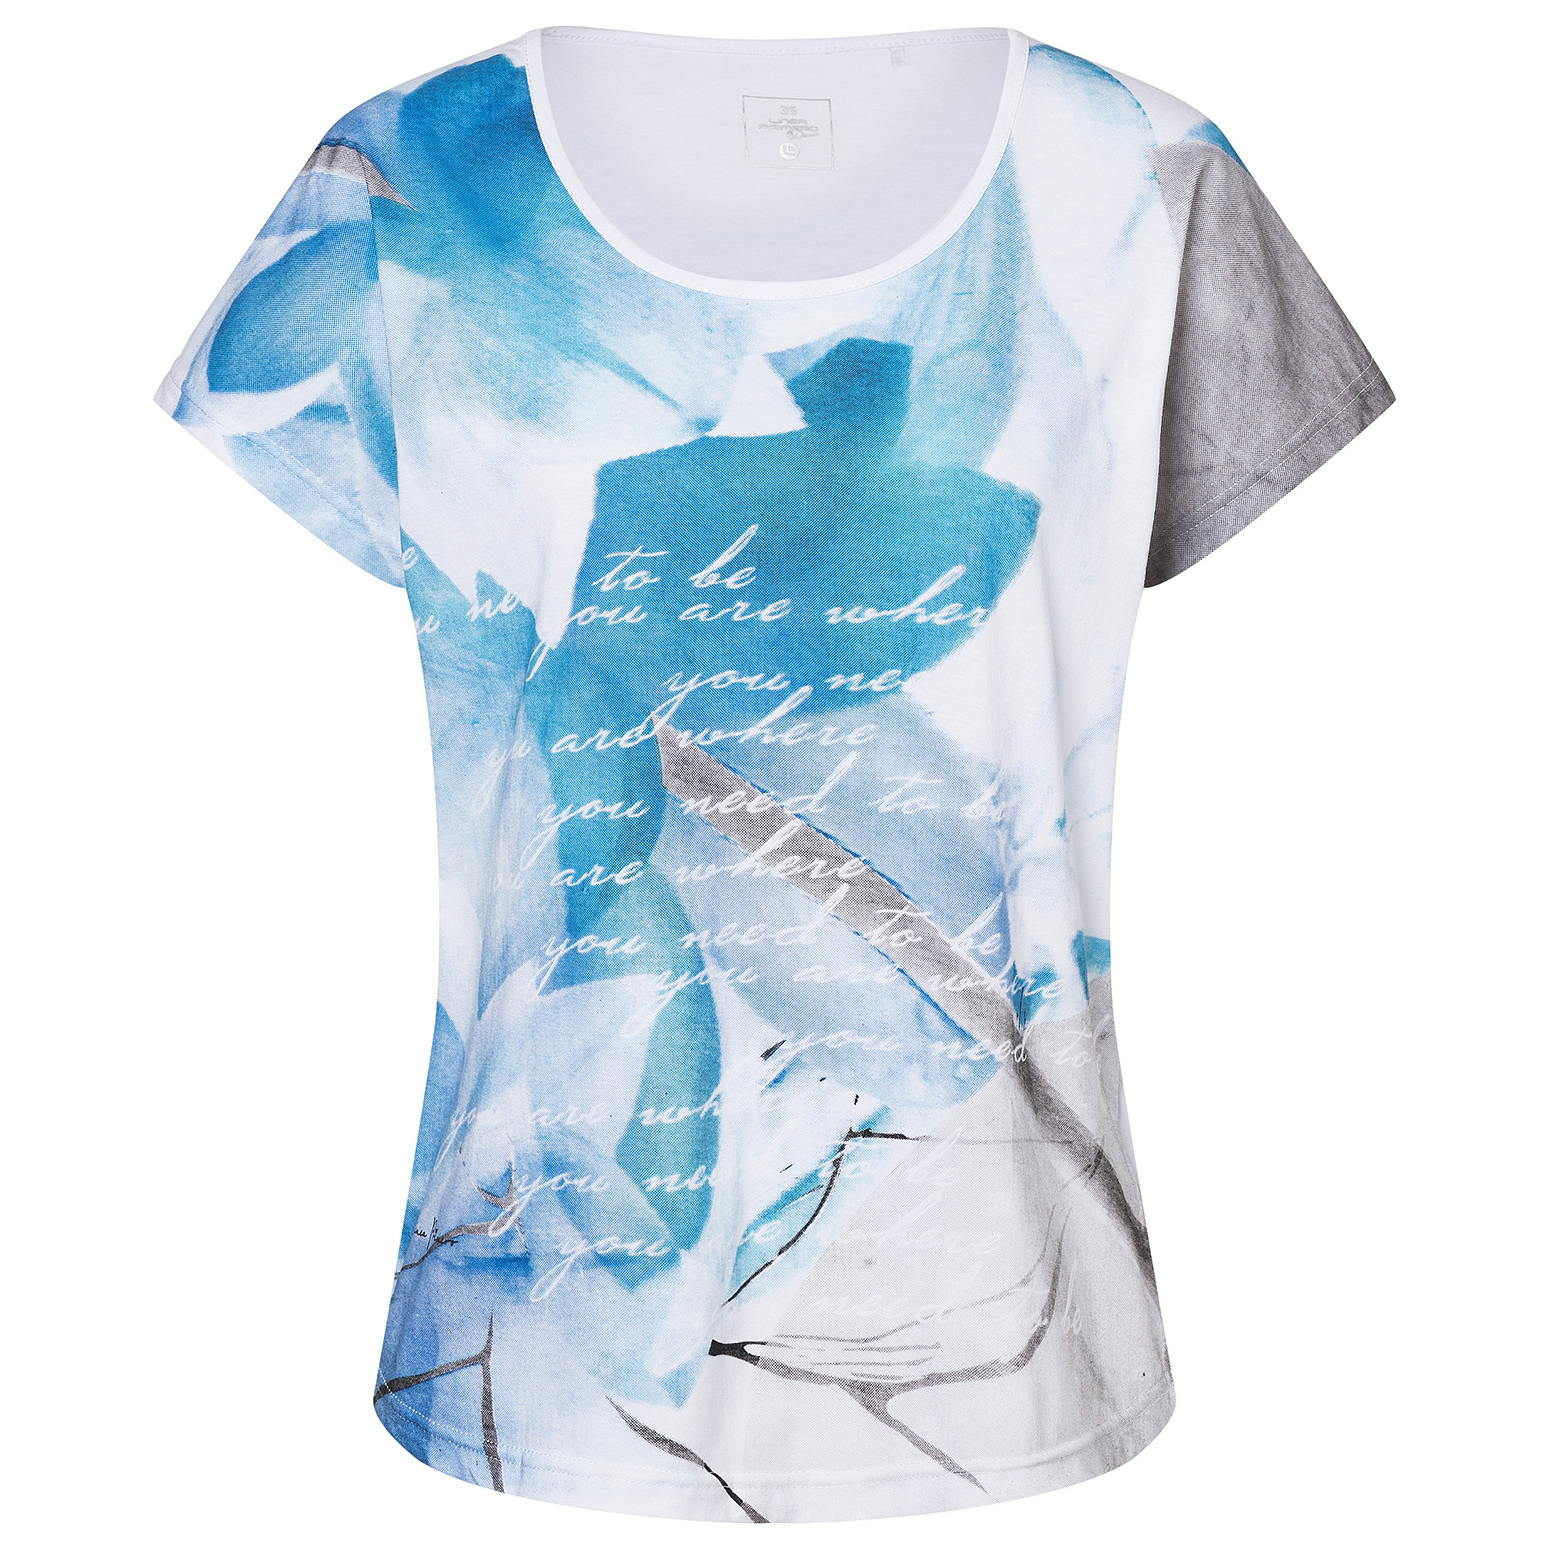 Linea Primero Edda - Damen T-Shirt Baumwoll-Poly Mix